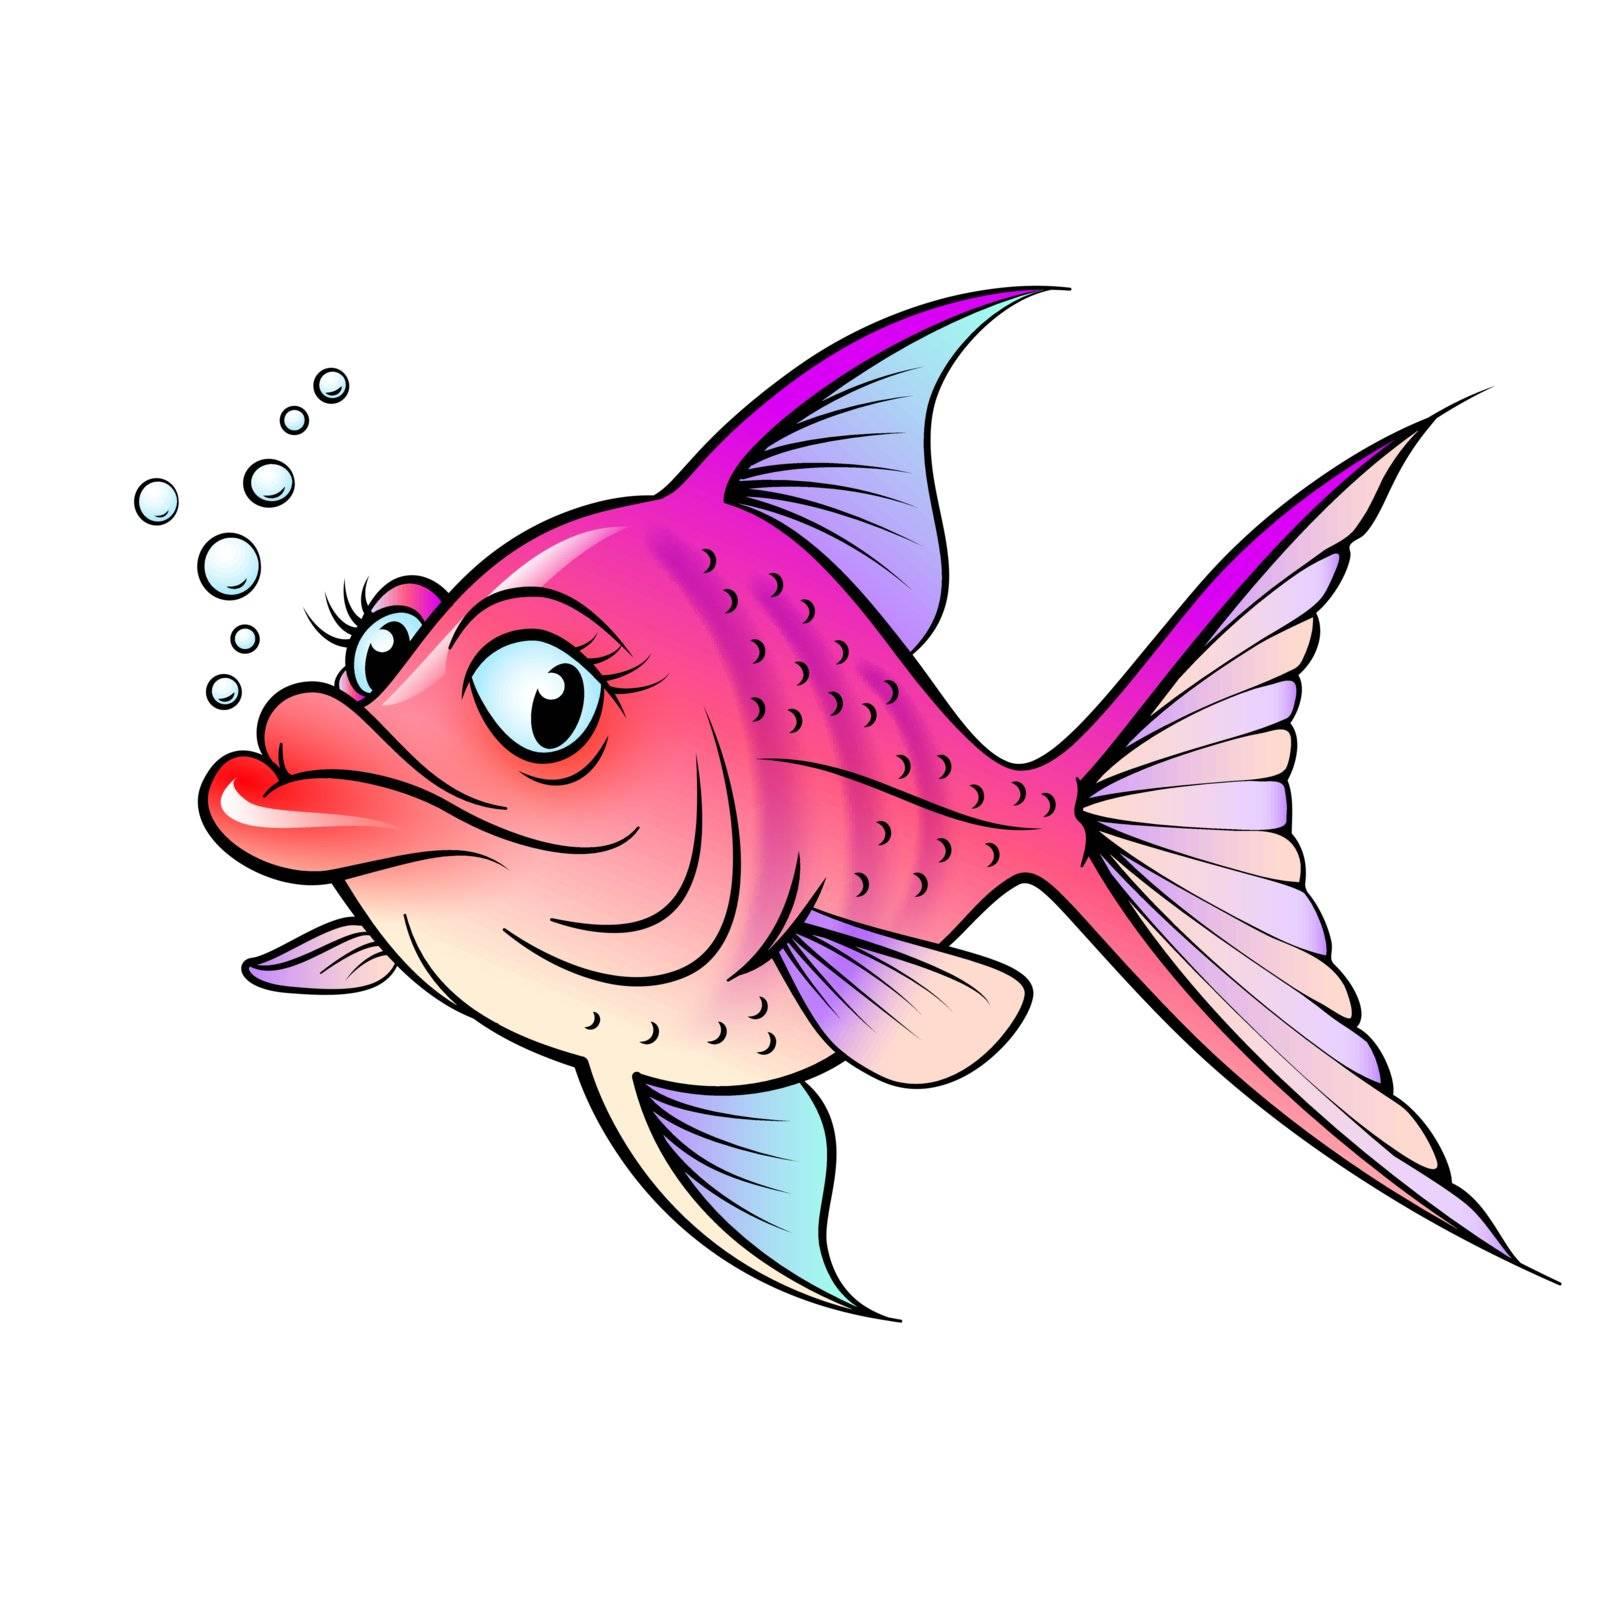 Cartoon fish. Illustration for design on white background